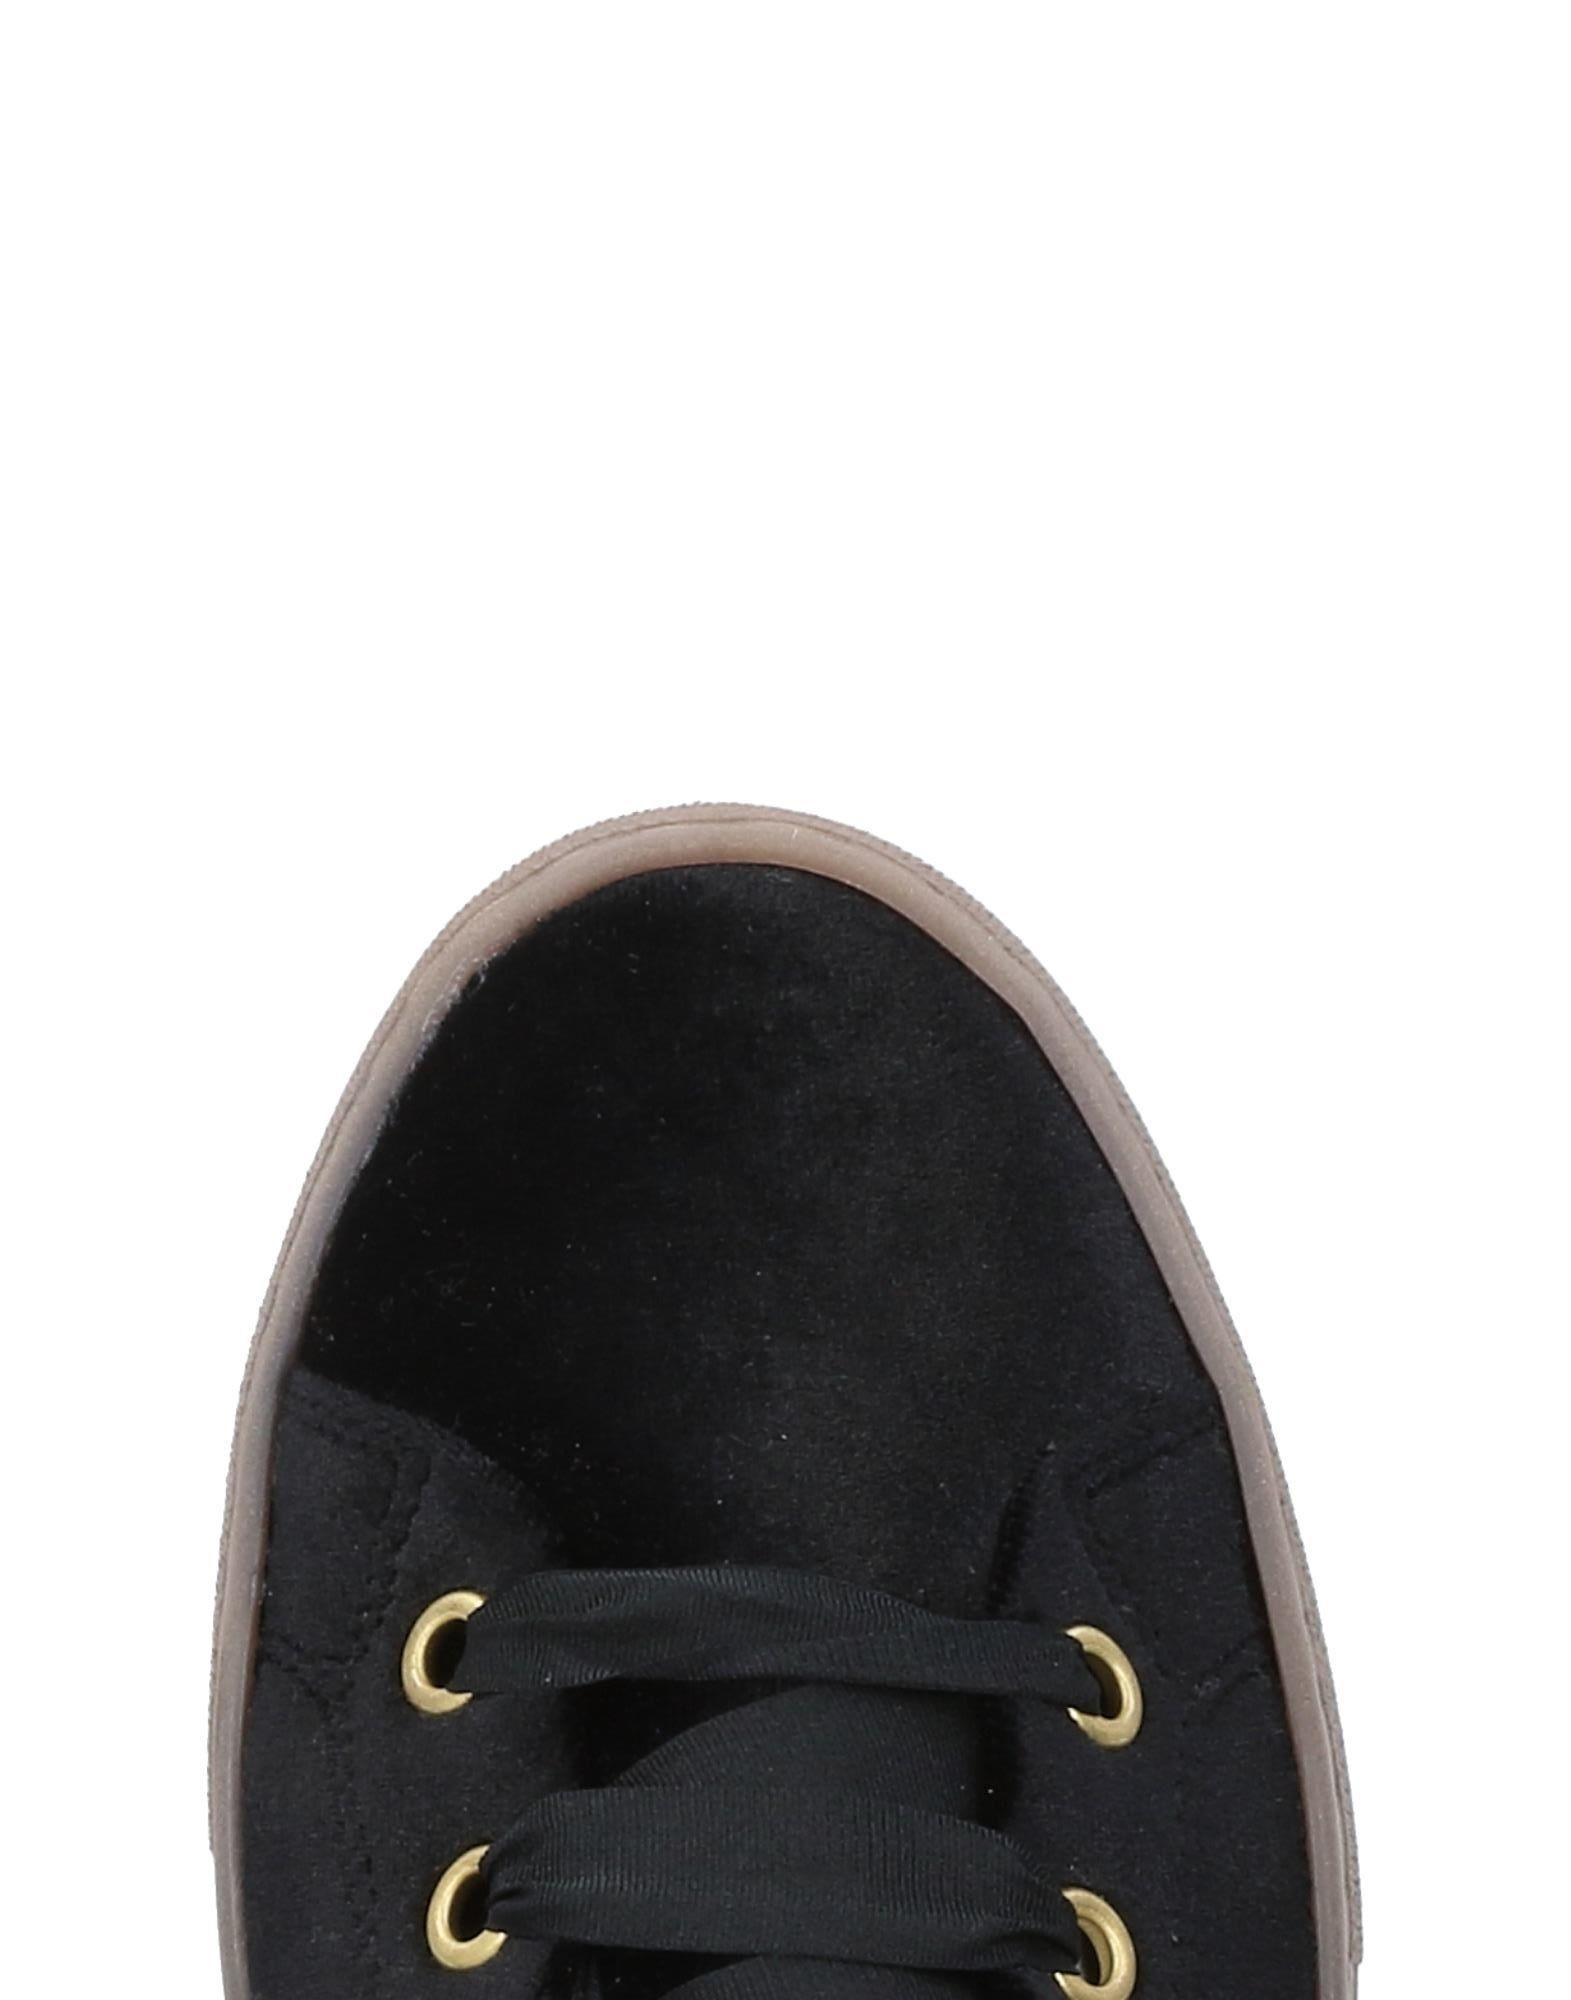 Pennyblack Sneakers Sneakers Sneakers - Women Pennyblack Sneakers online on  United Kingdom - 11486690OH e6d1fb